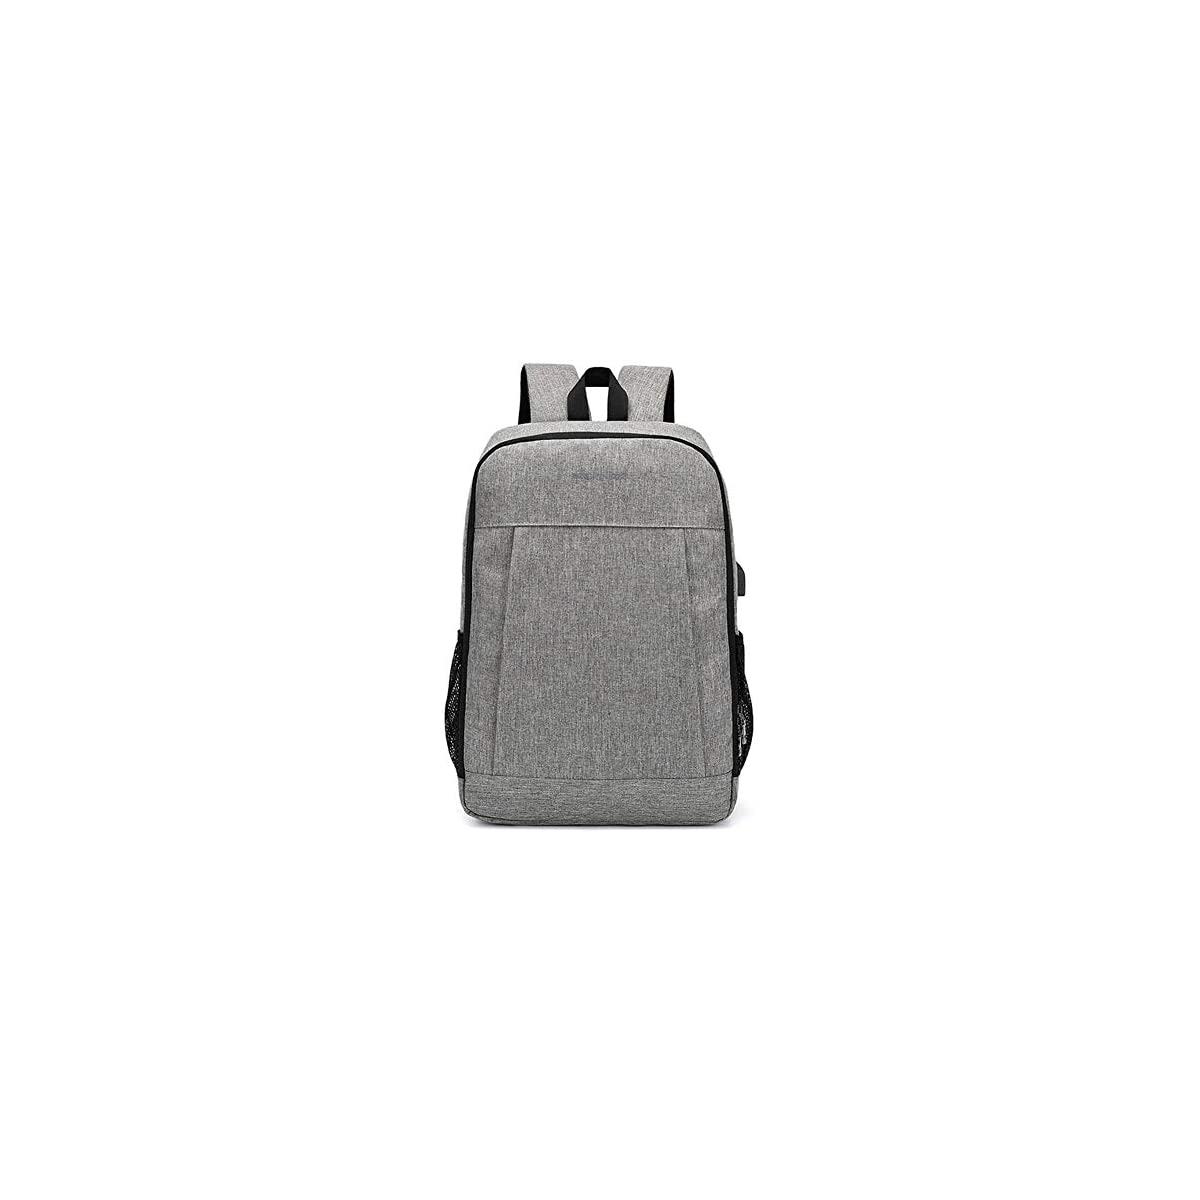 518jyQ6rJCL. SS1200  - BEIBAO Mochila cargada USB Mochila Computer Negocio Ocio Gran Capacidad Impermeable Mochila de Viaje(Gris,Negro,Azul,Gris Oscuro)